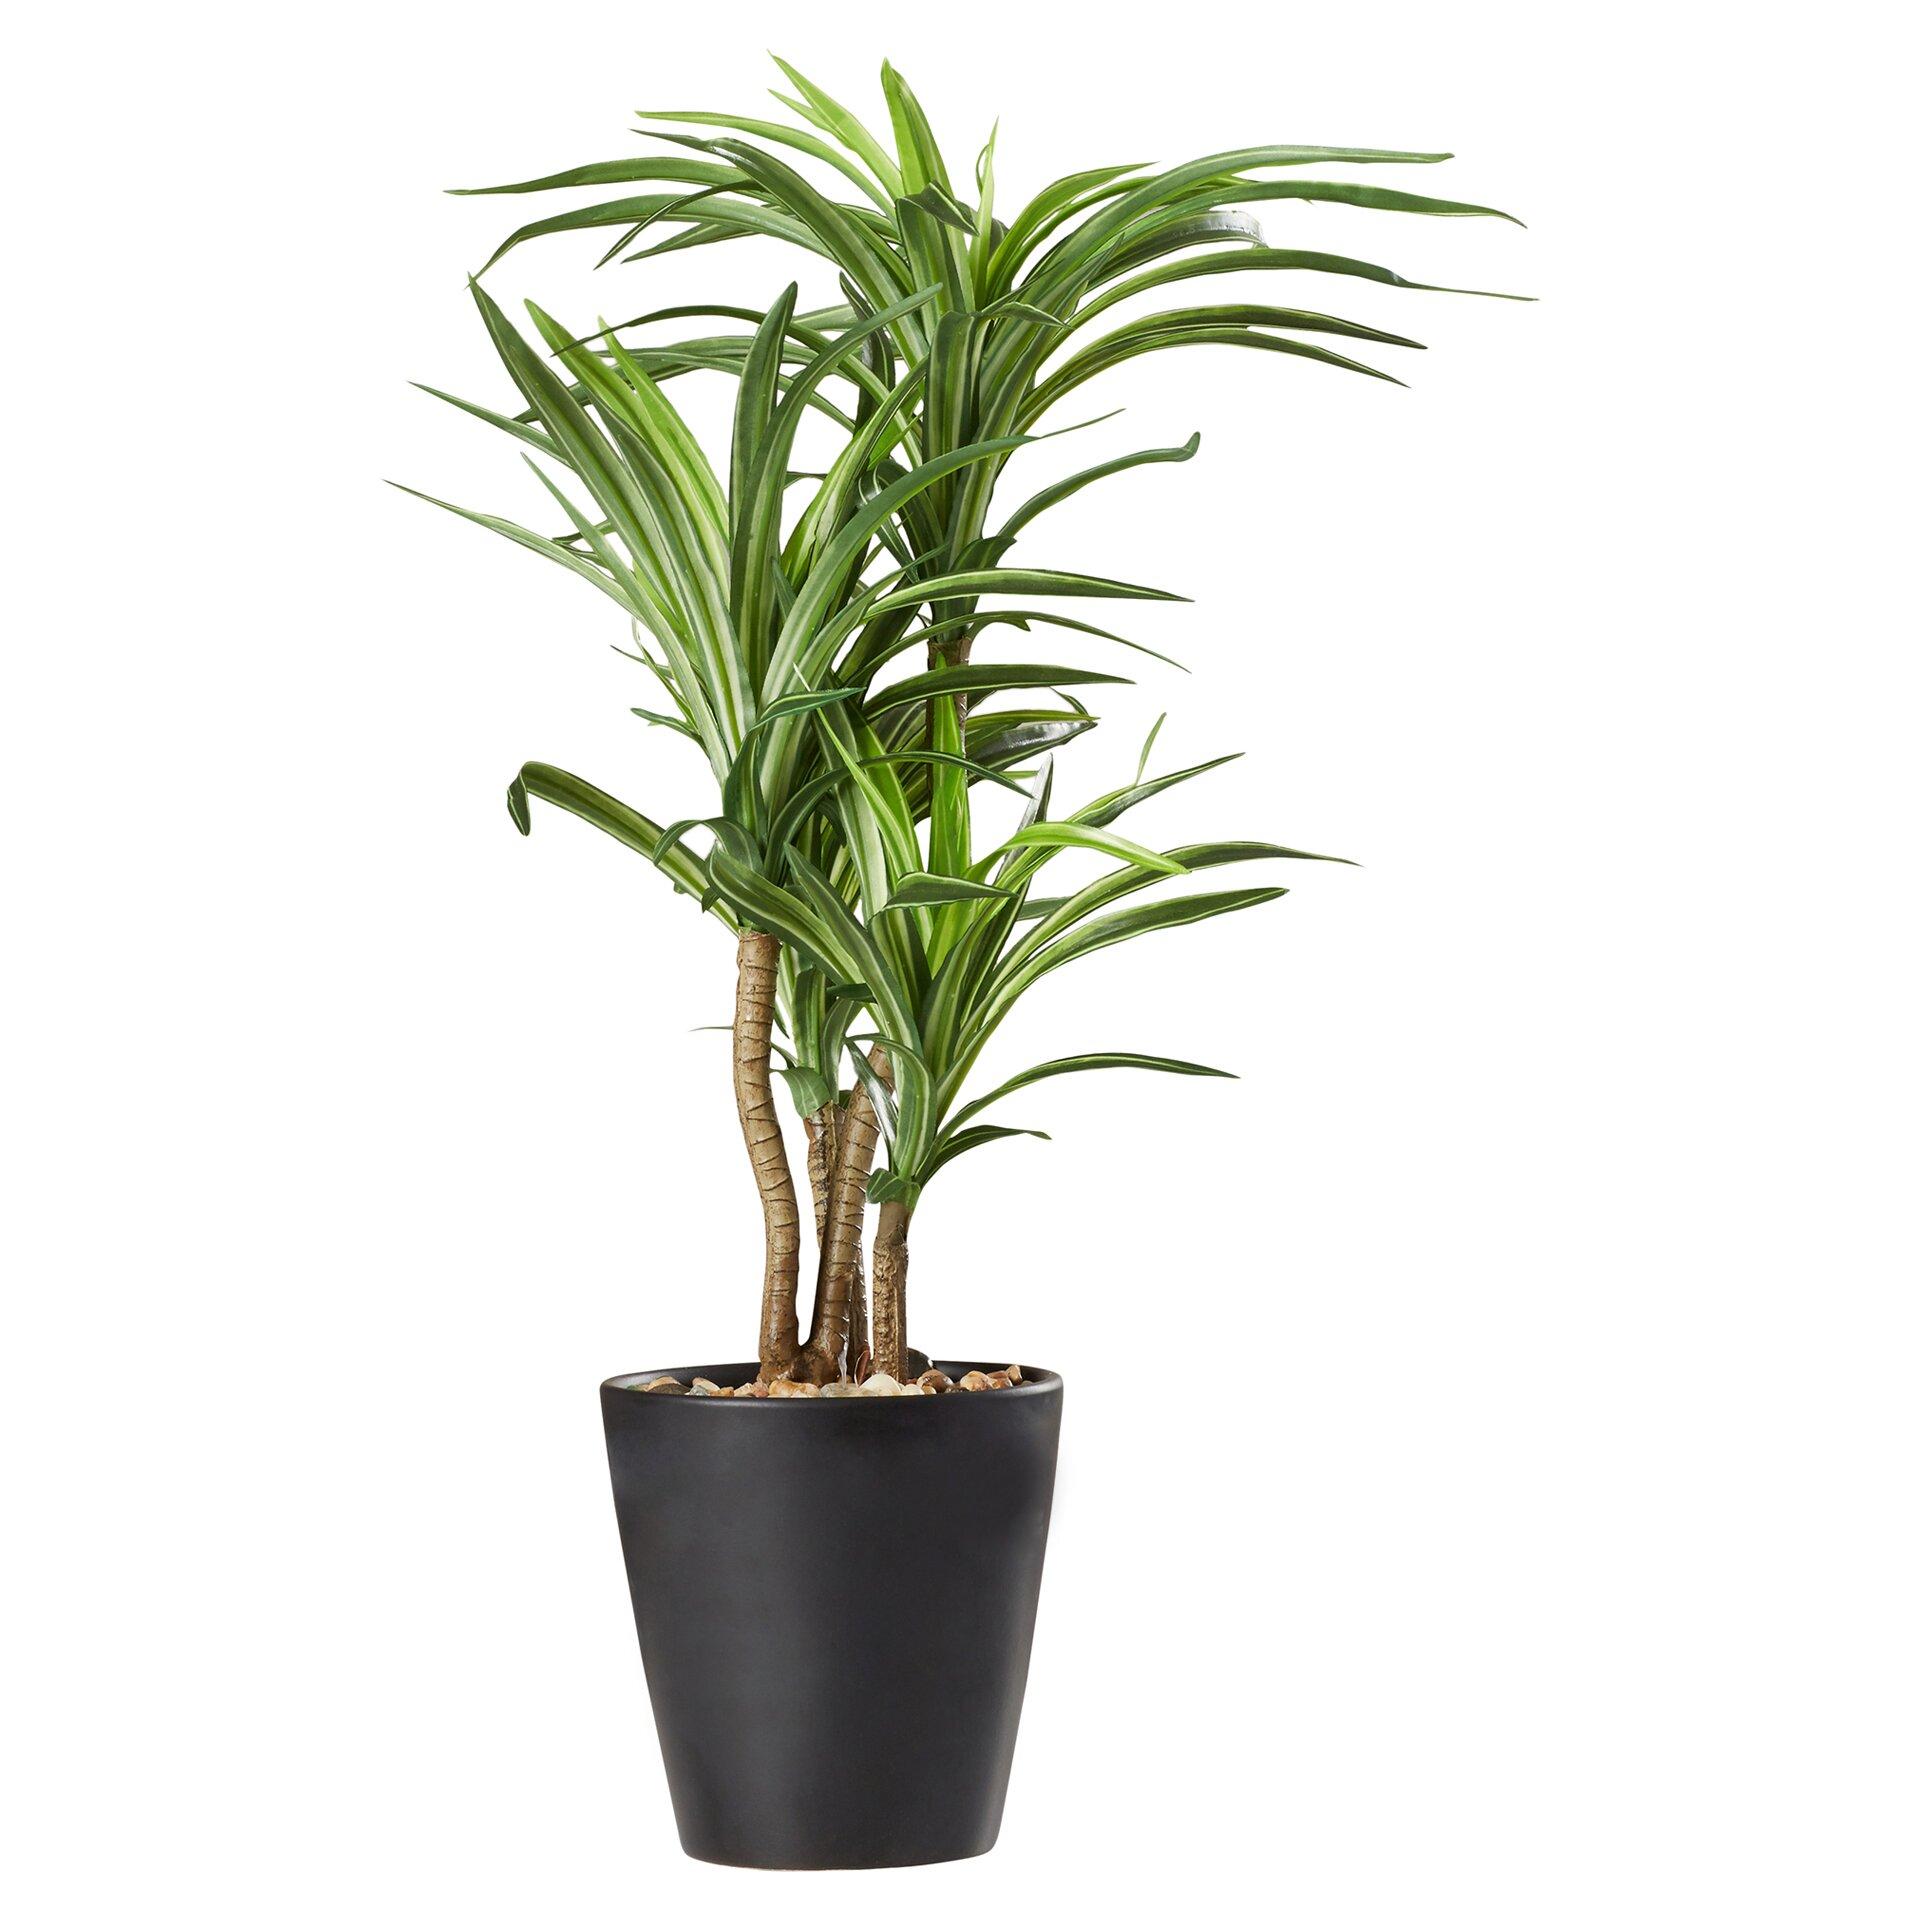 Varick Gallery Dracena Desk Top Plant In Pot Reviews